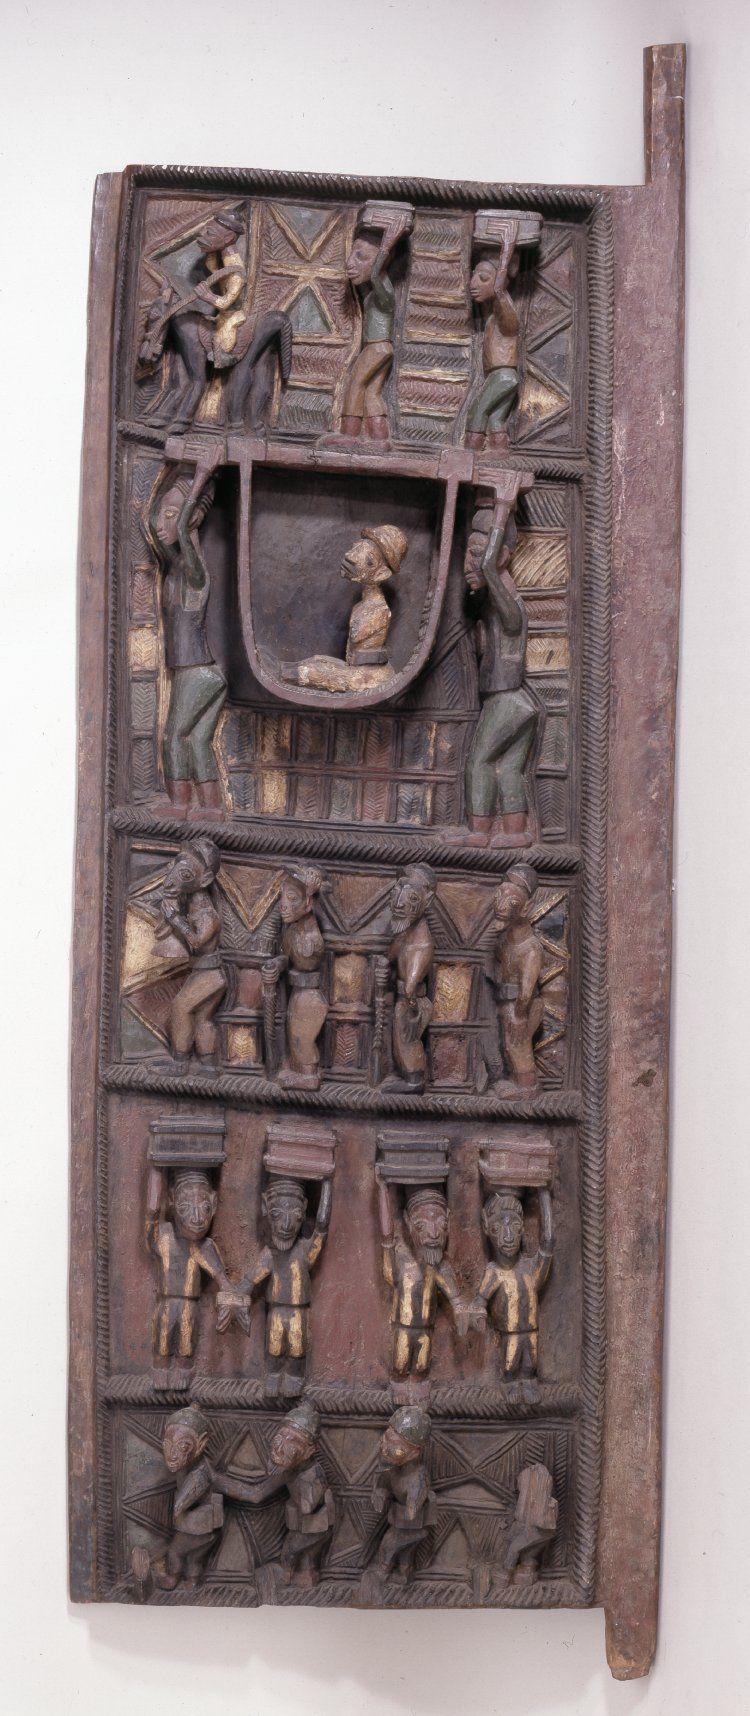 Yoruba Ilekun Palace Door Ekiti Ise Nigeria ifapeter